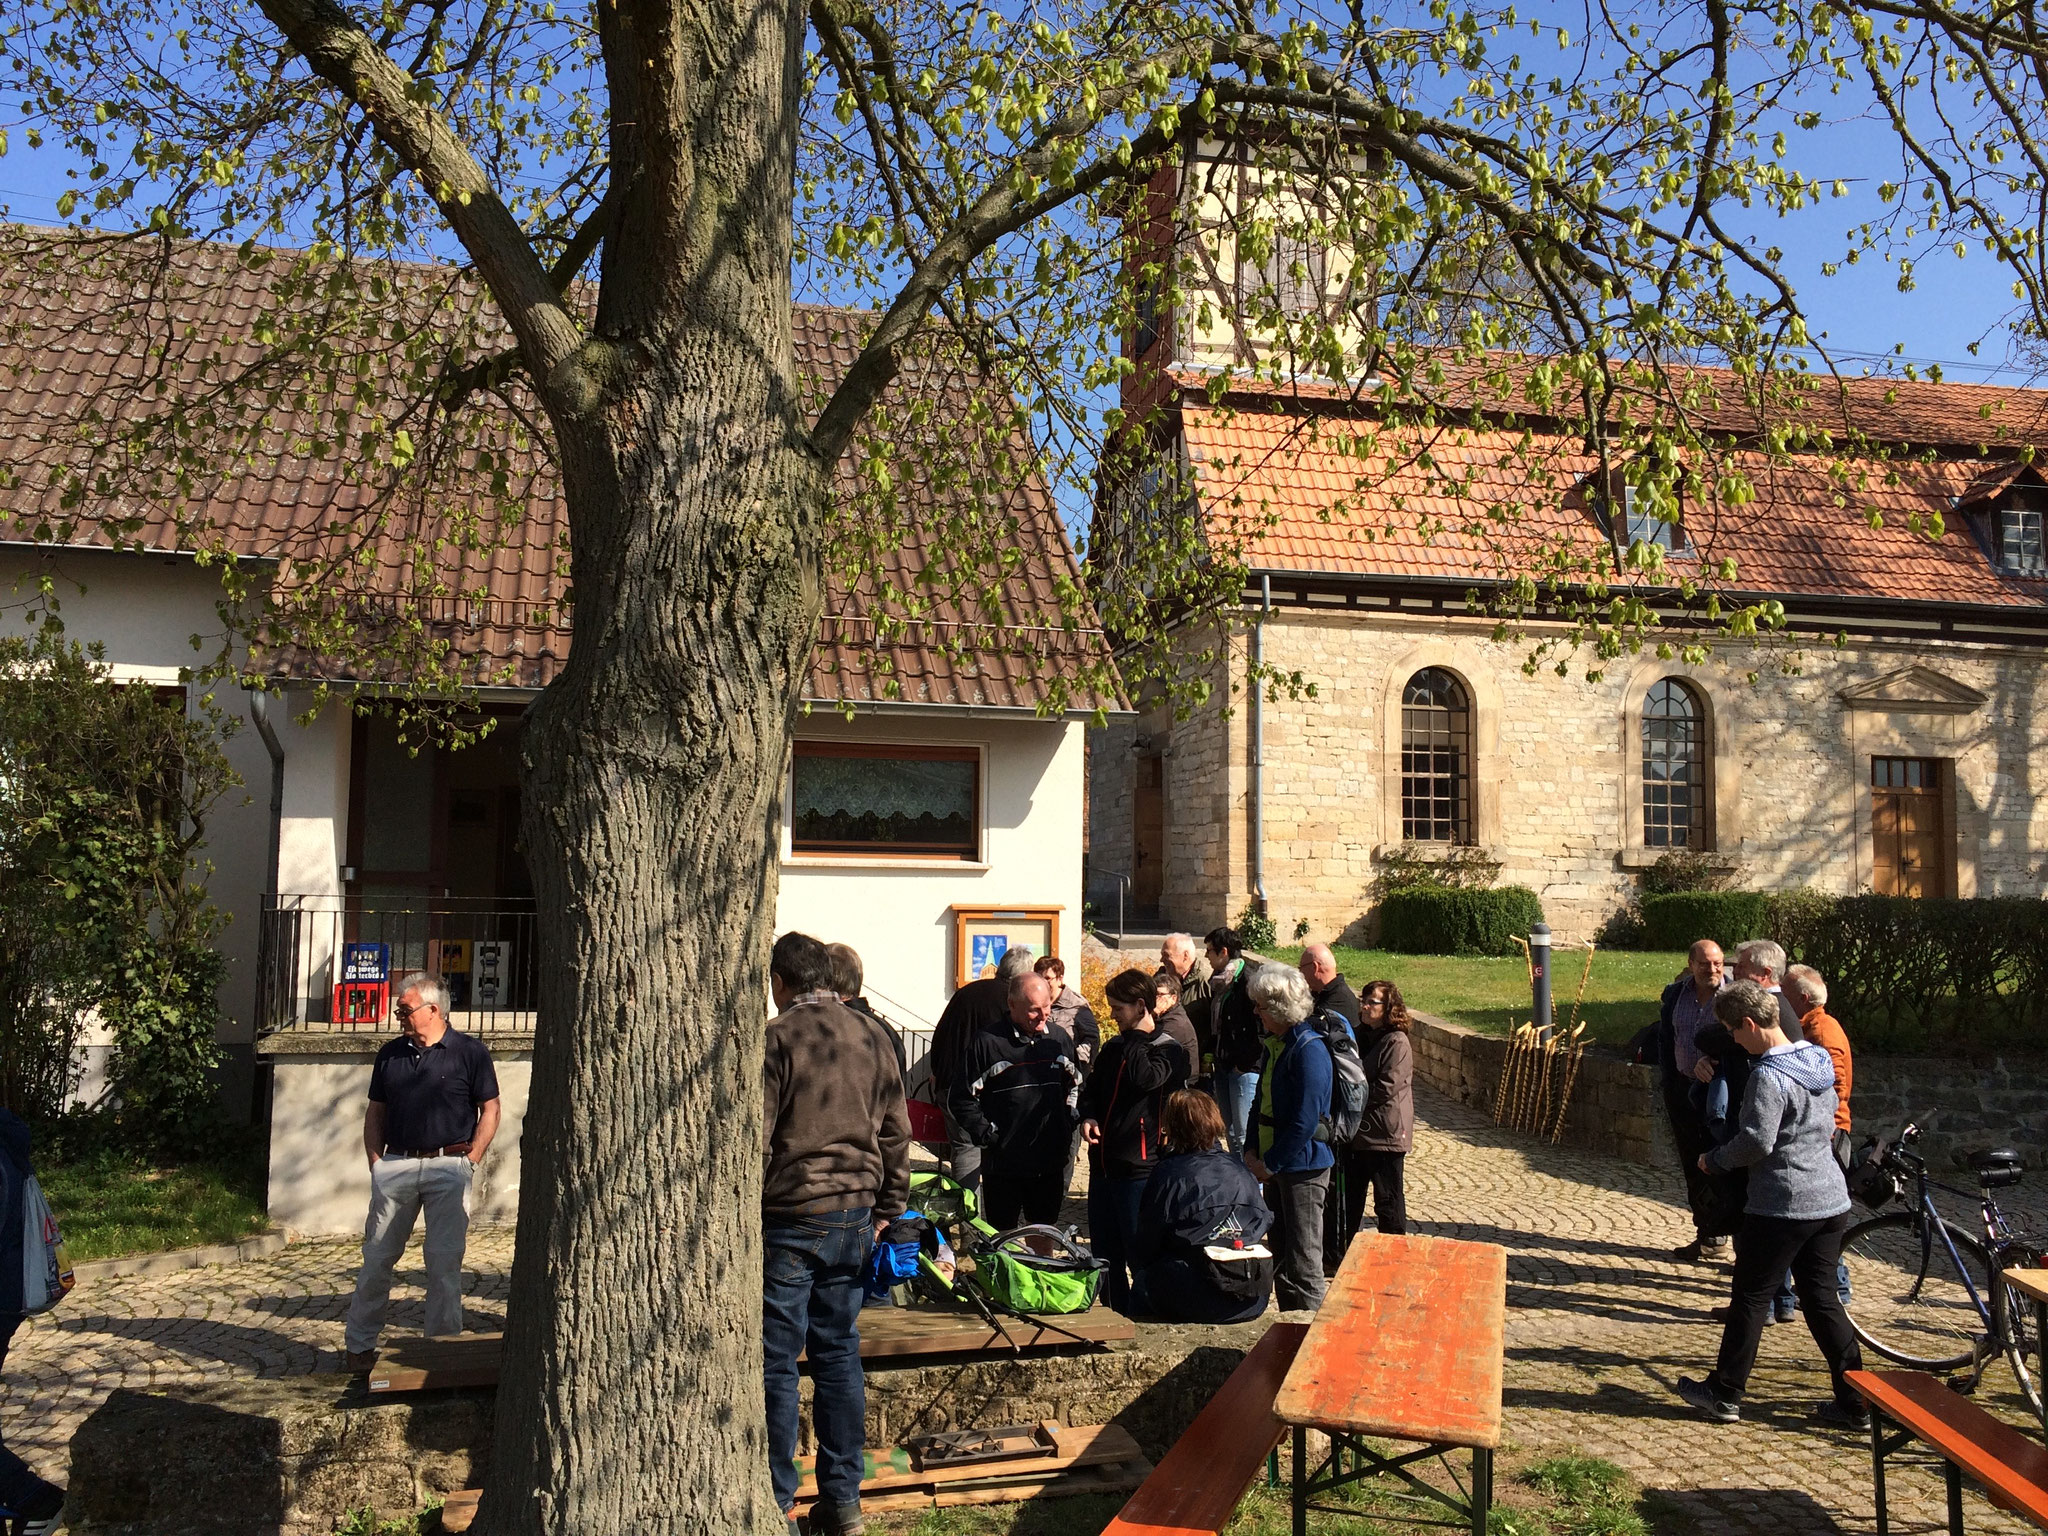 Feier zur Zertifizierung der Lüderbacher Kirche als Pilger- und Radwegekirche